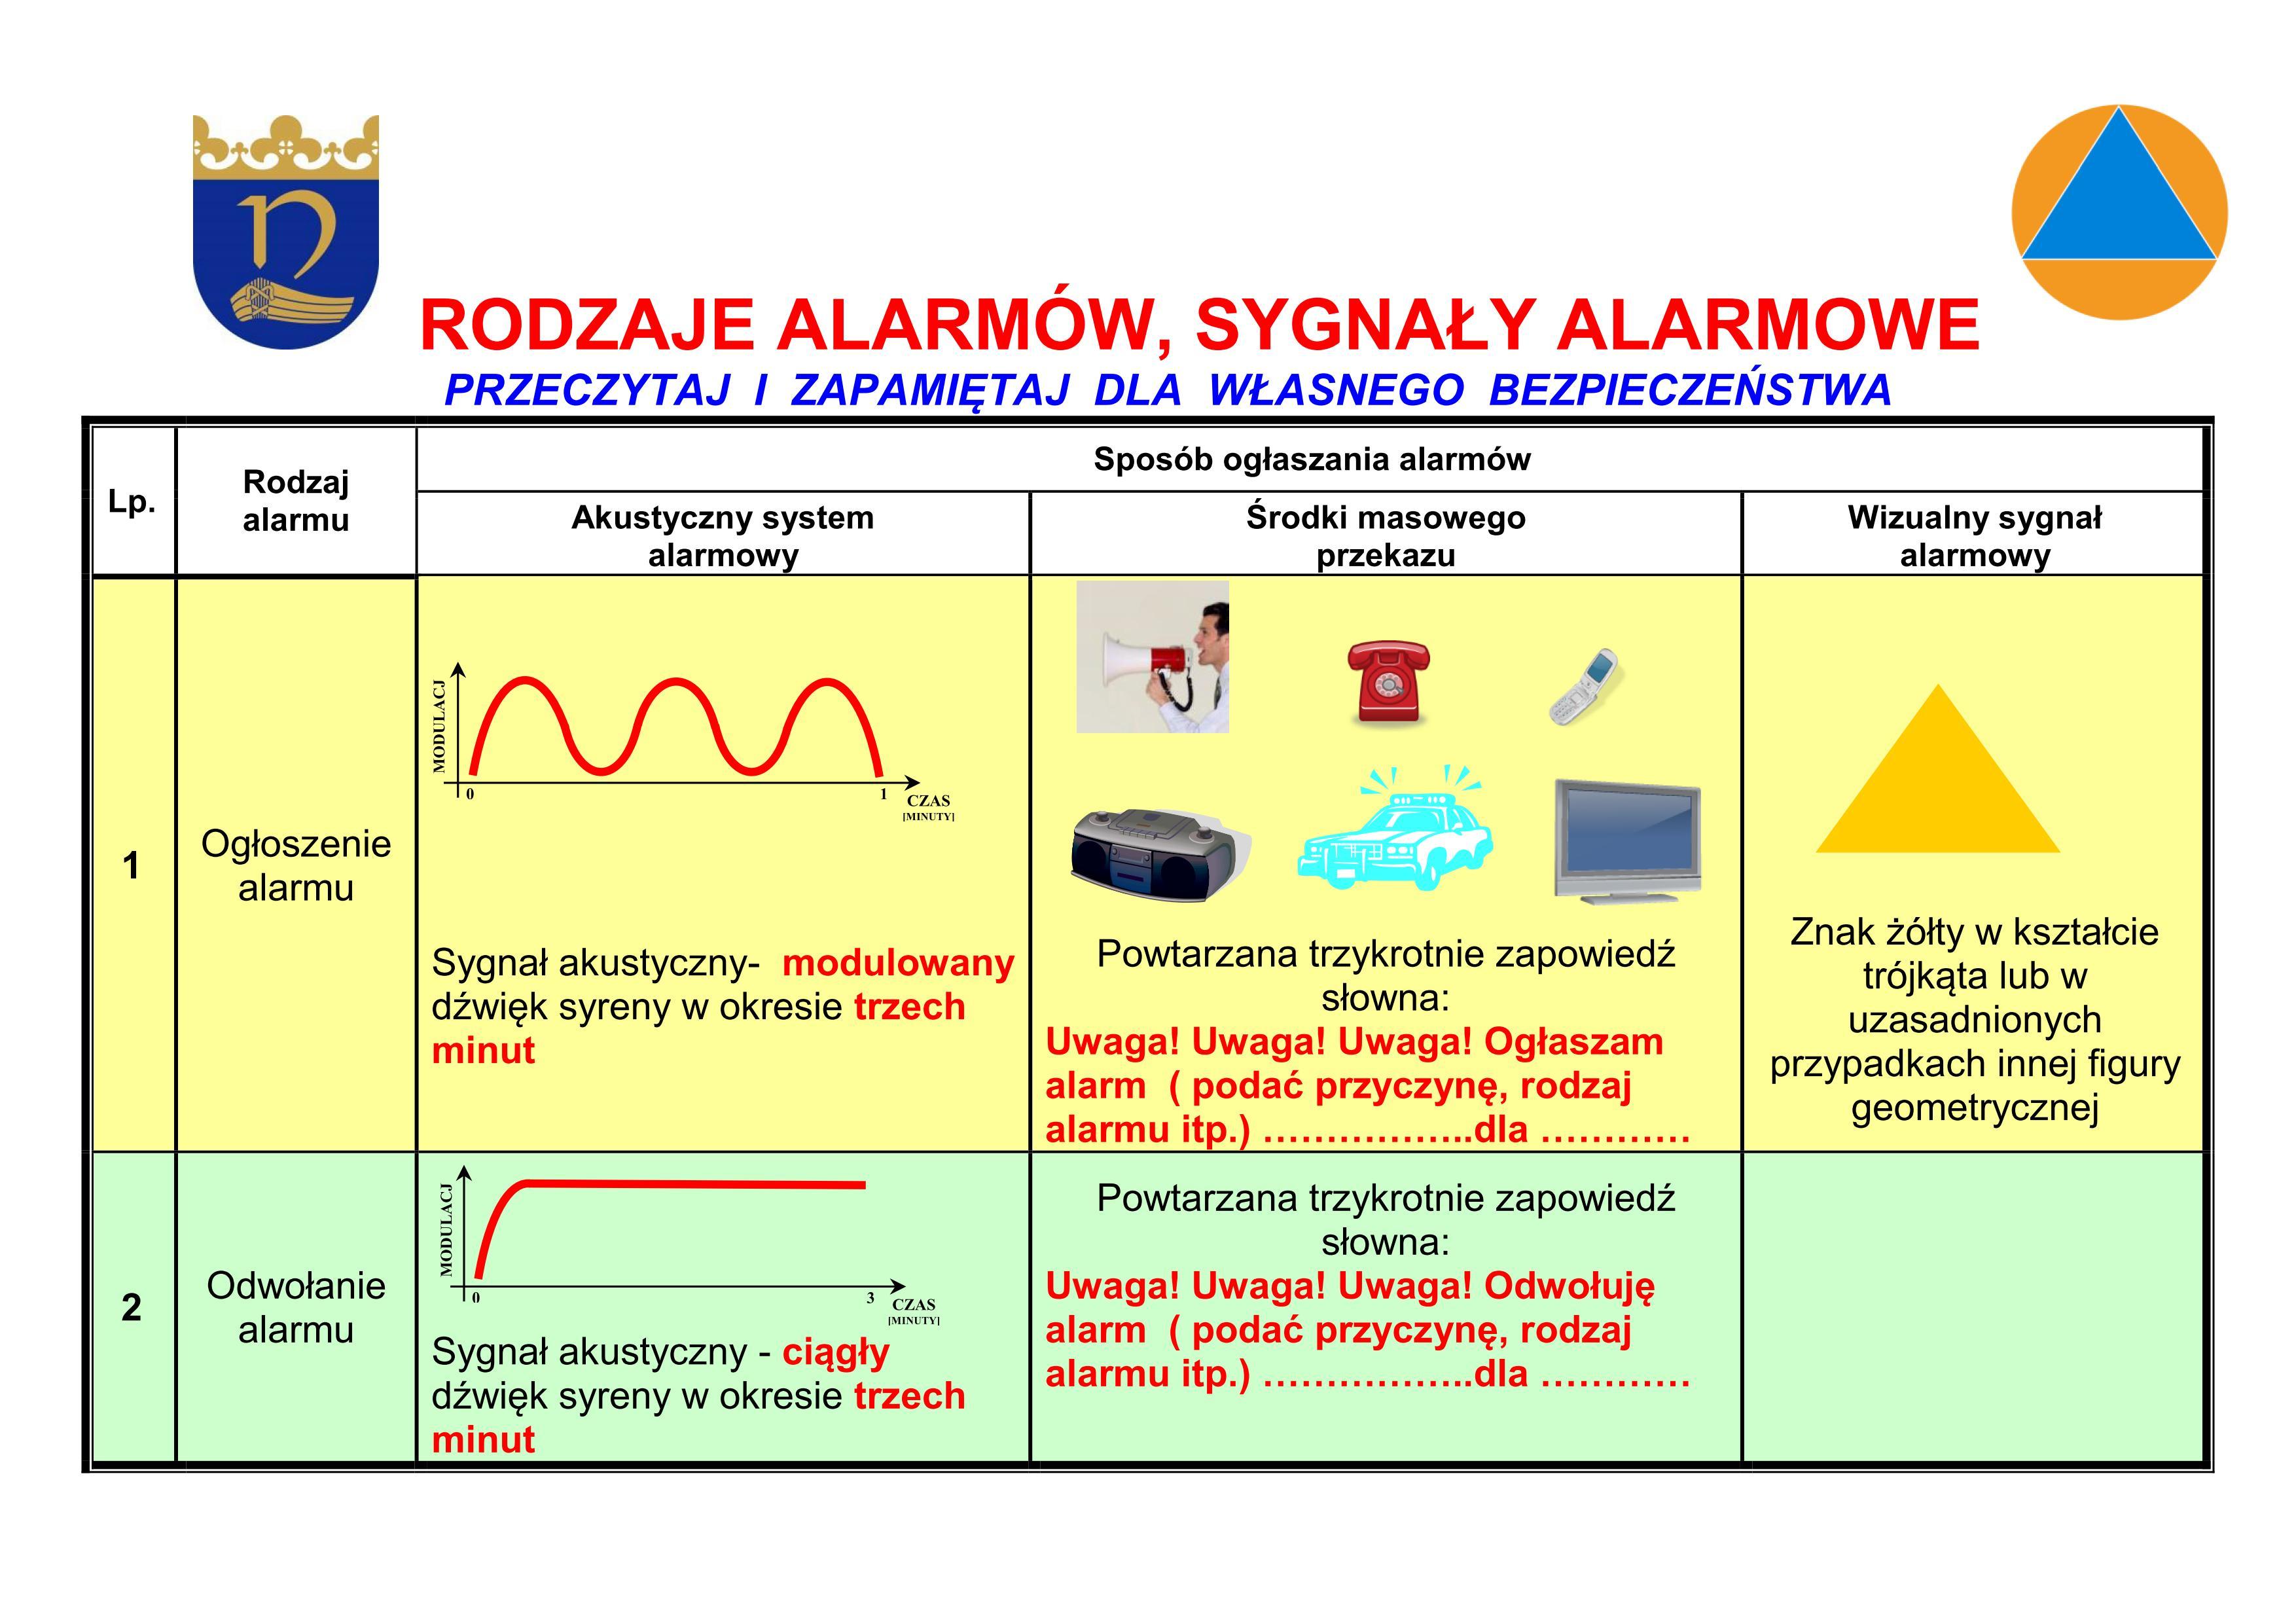 sygnaly alarmowe1